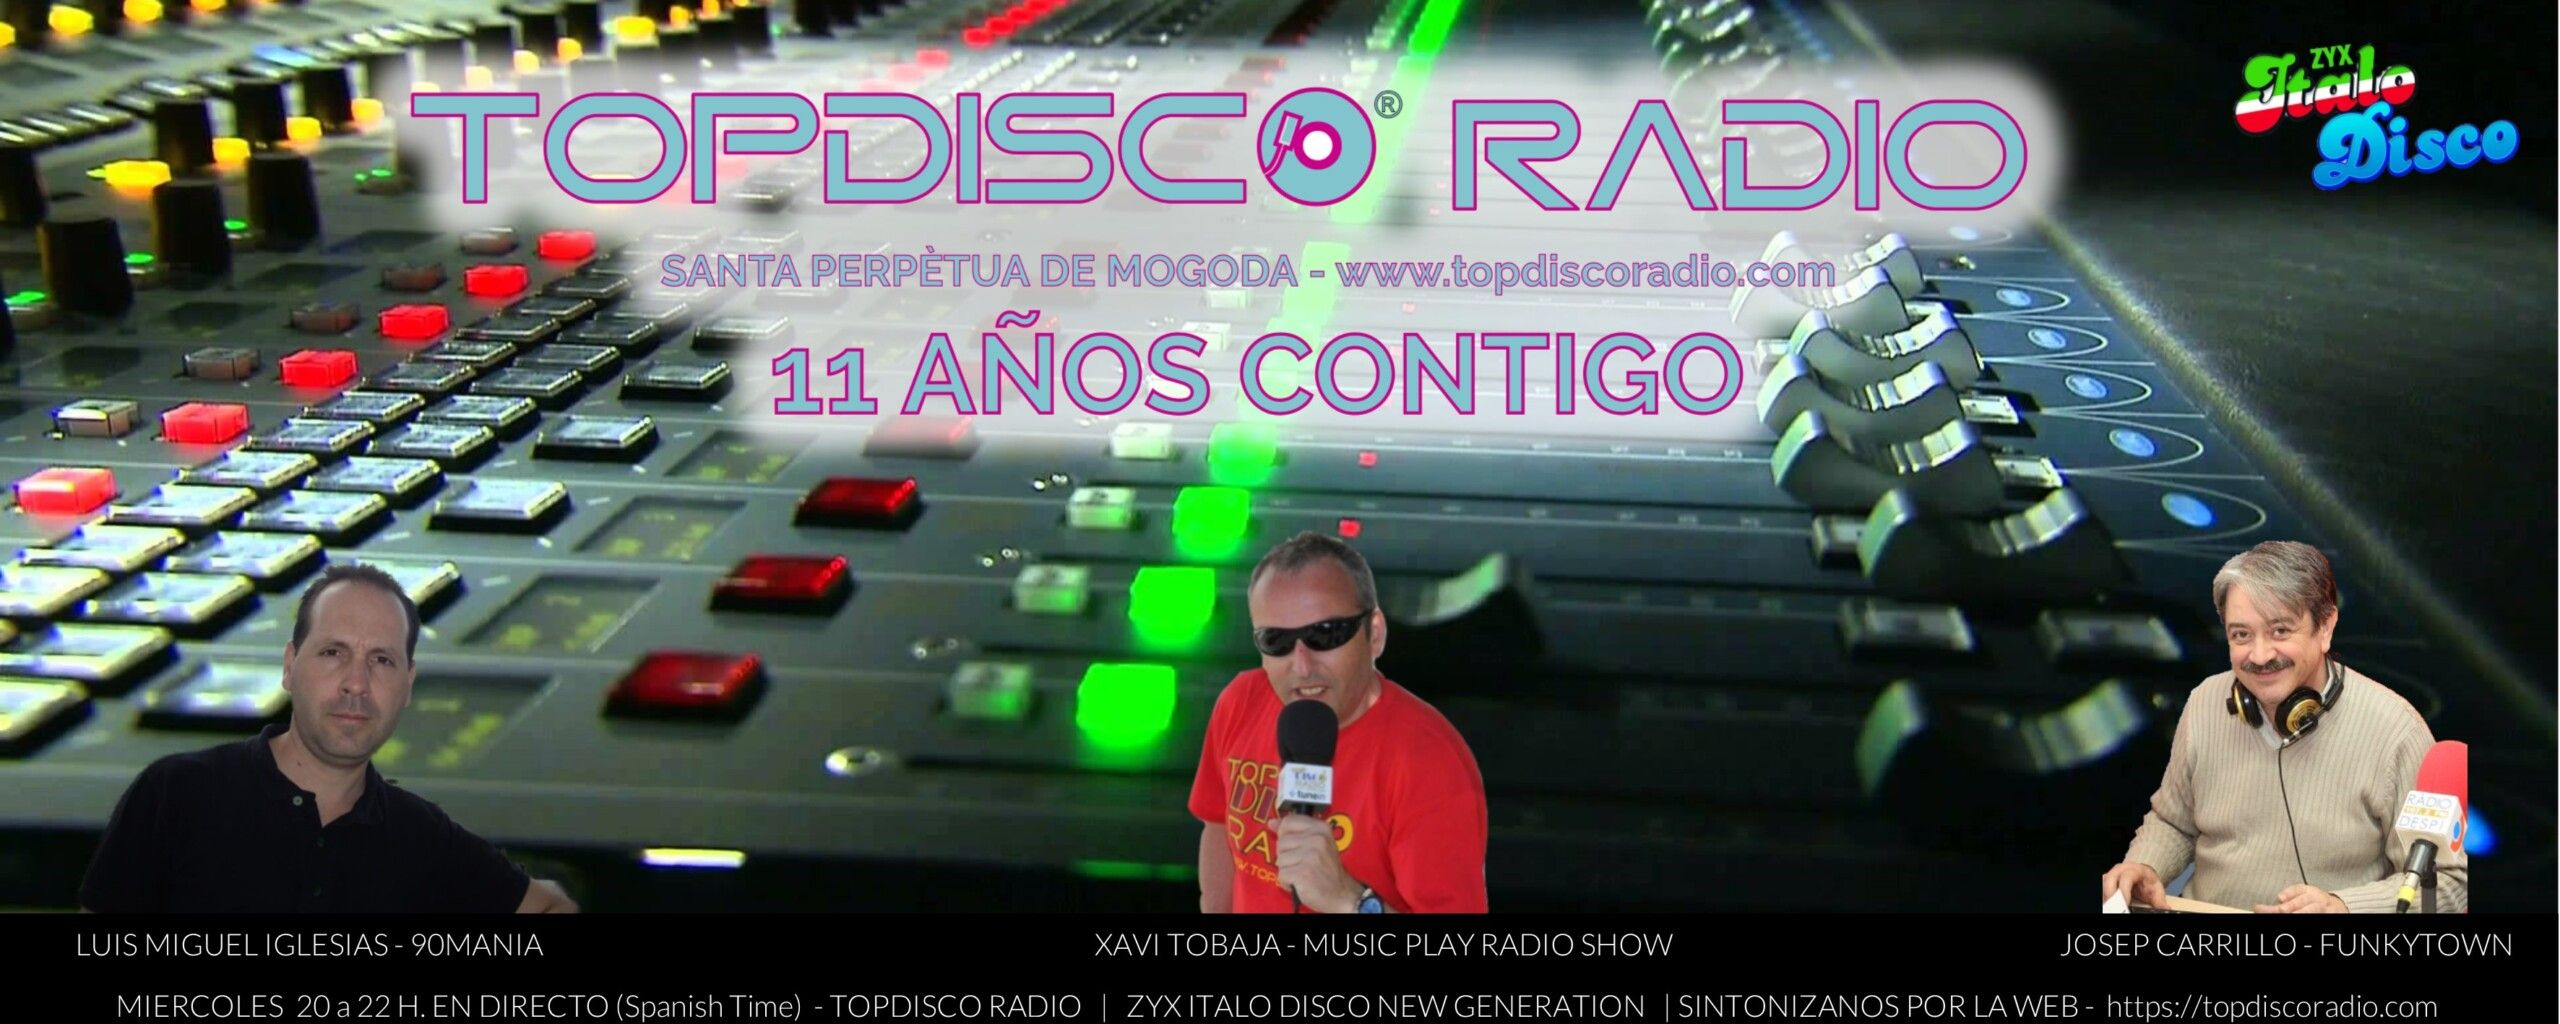 TOPDISCO RADIO TEMPORADA 2021-2022